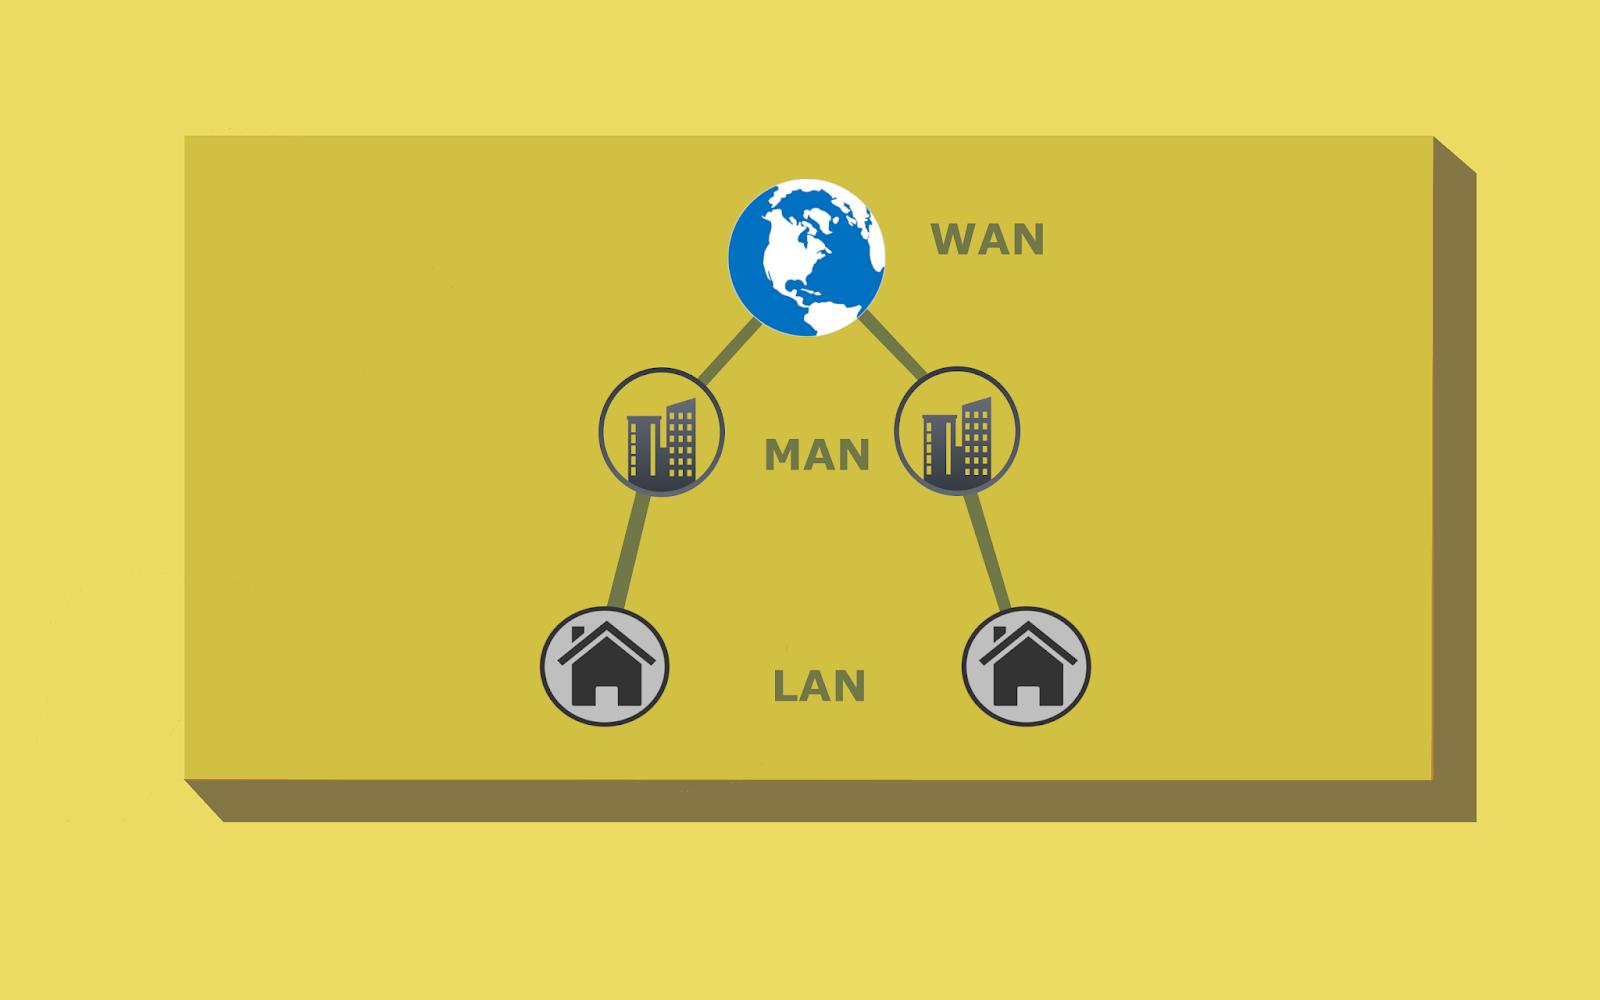 Mengenal Jenis Jaringan Komputer Berdasarkan Area